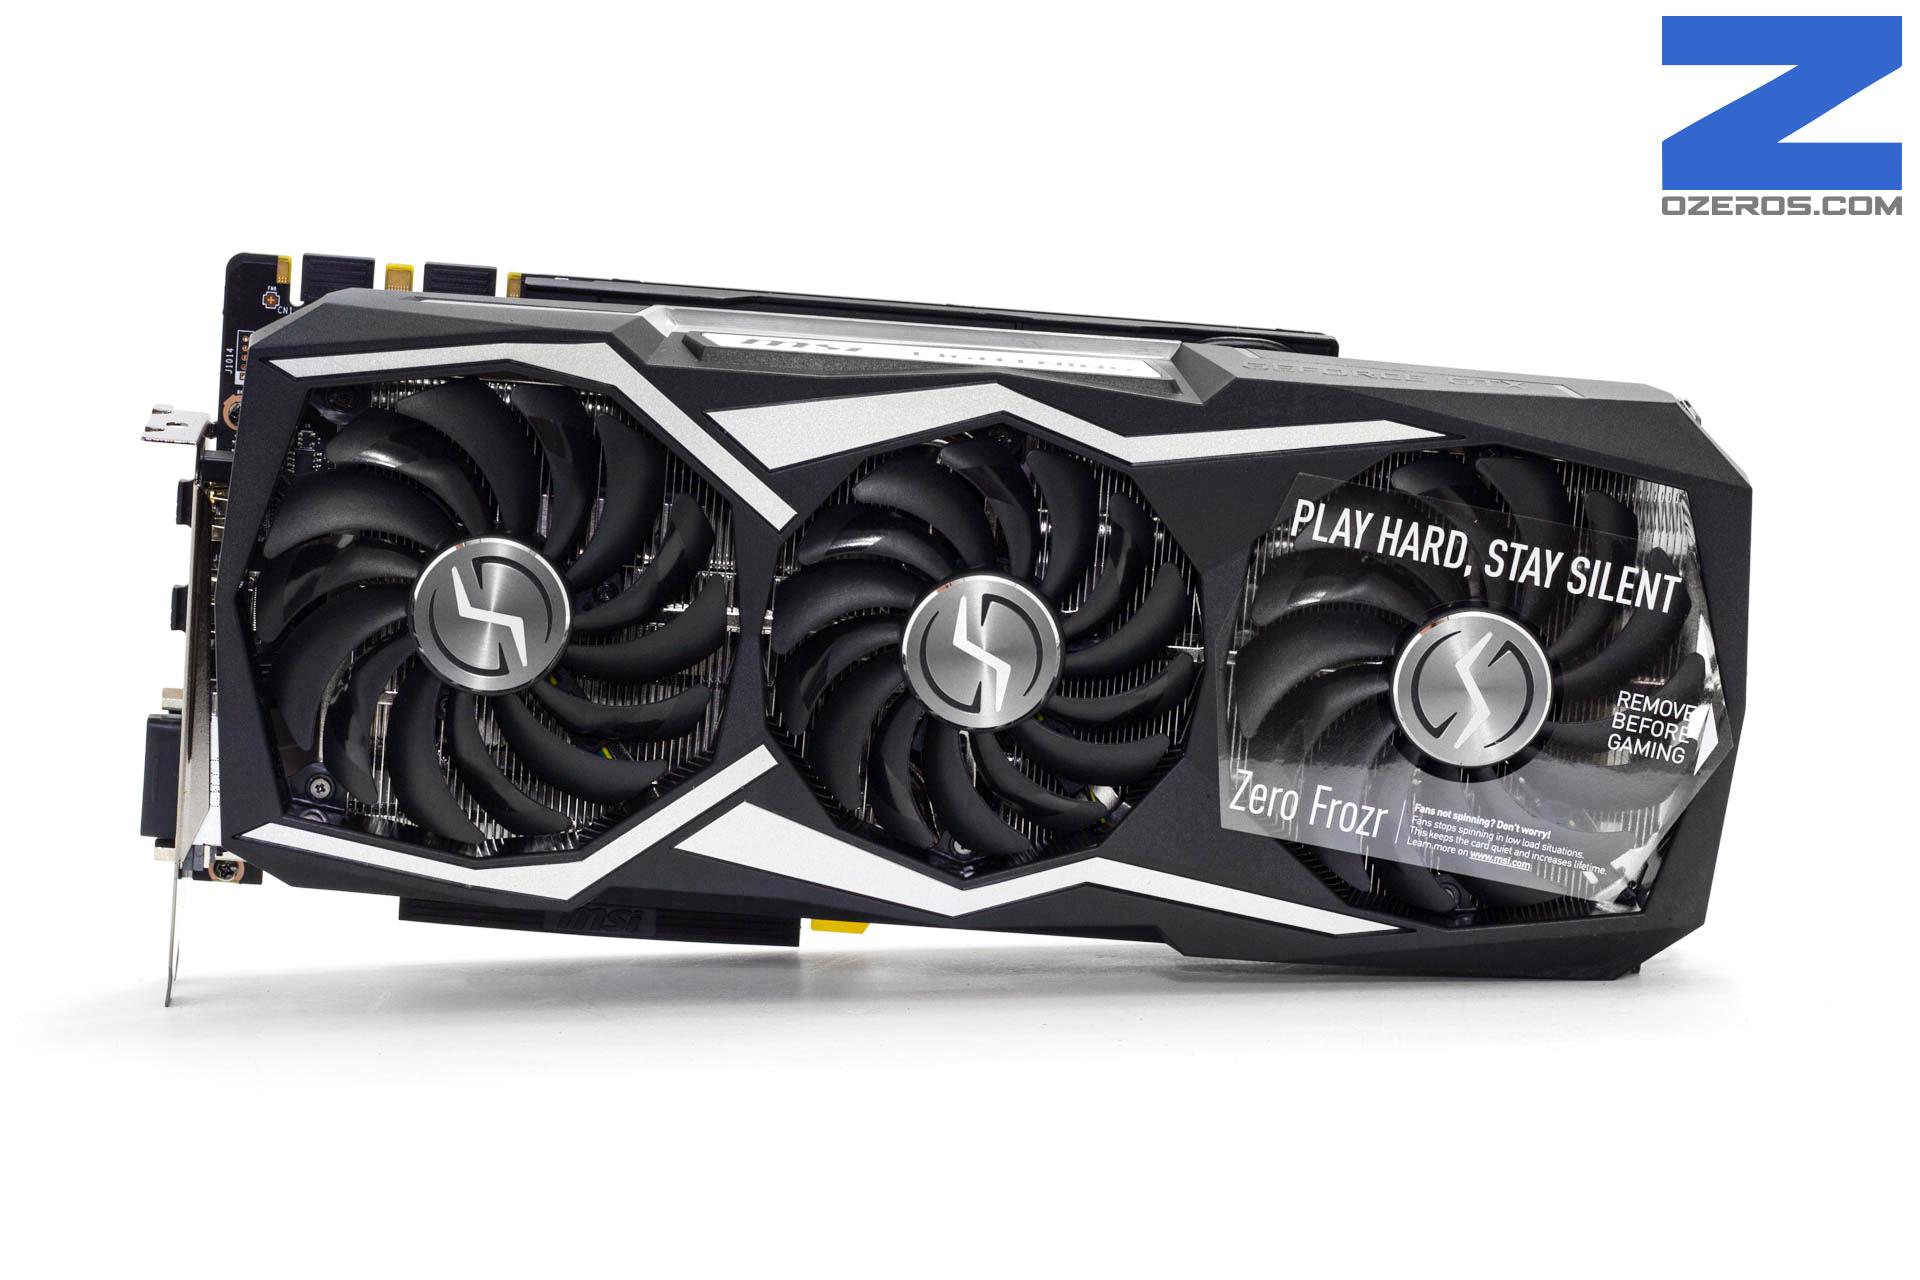 Review: Tarjeta Gráfica MSI GeForce GTX 1080 Ti Lightning Z